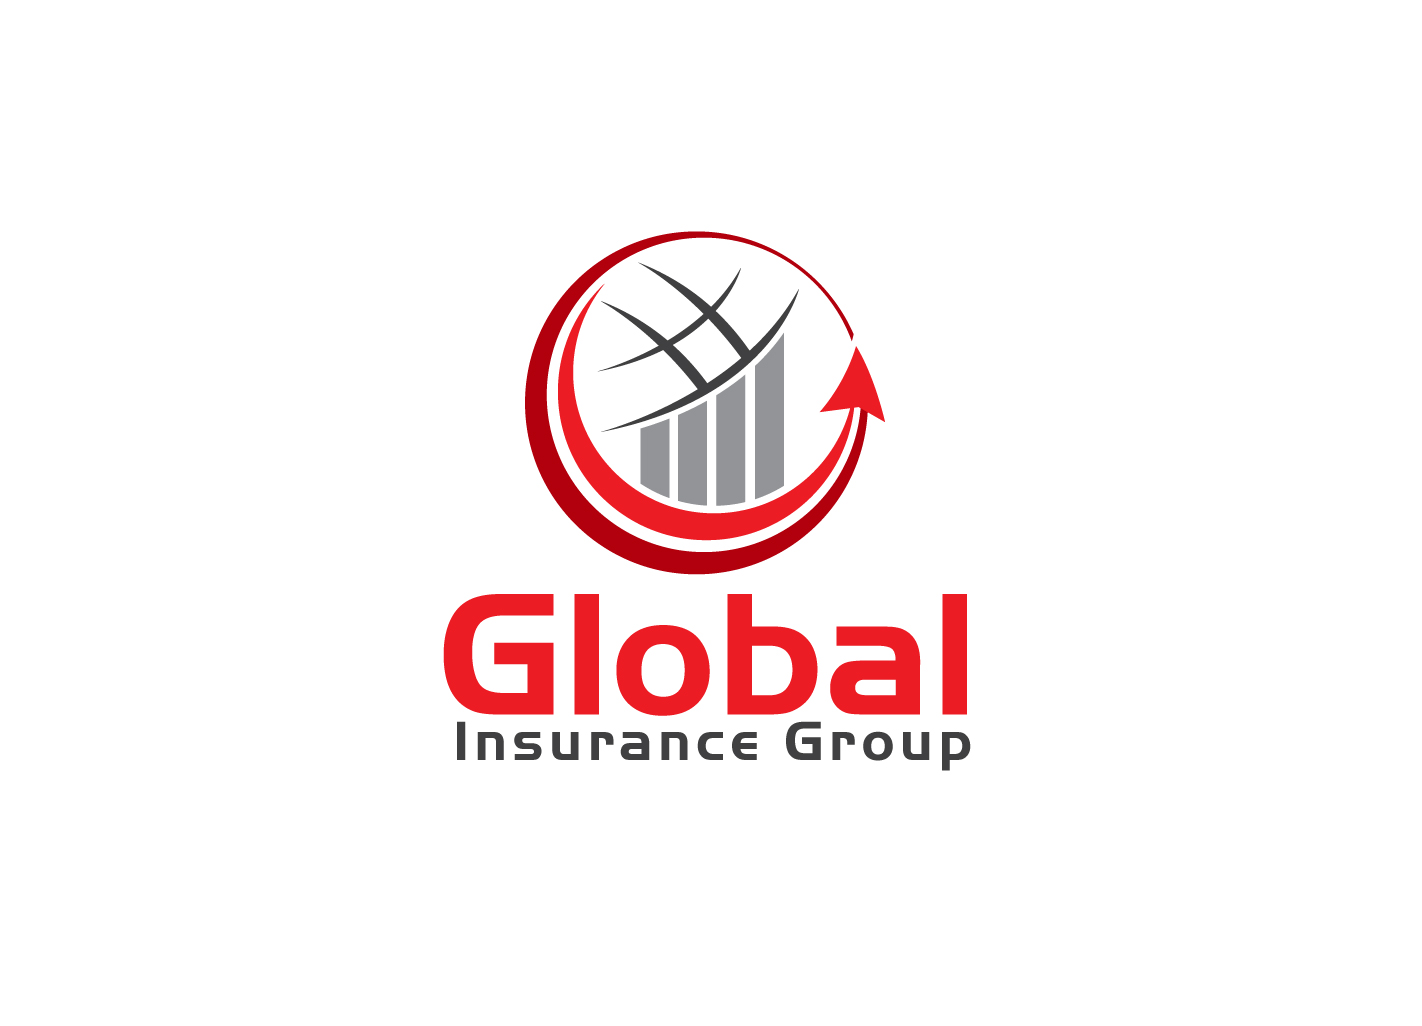 208 Professional Bold Insurance Logo Designs for Global ...